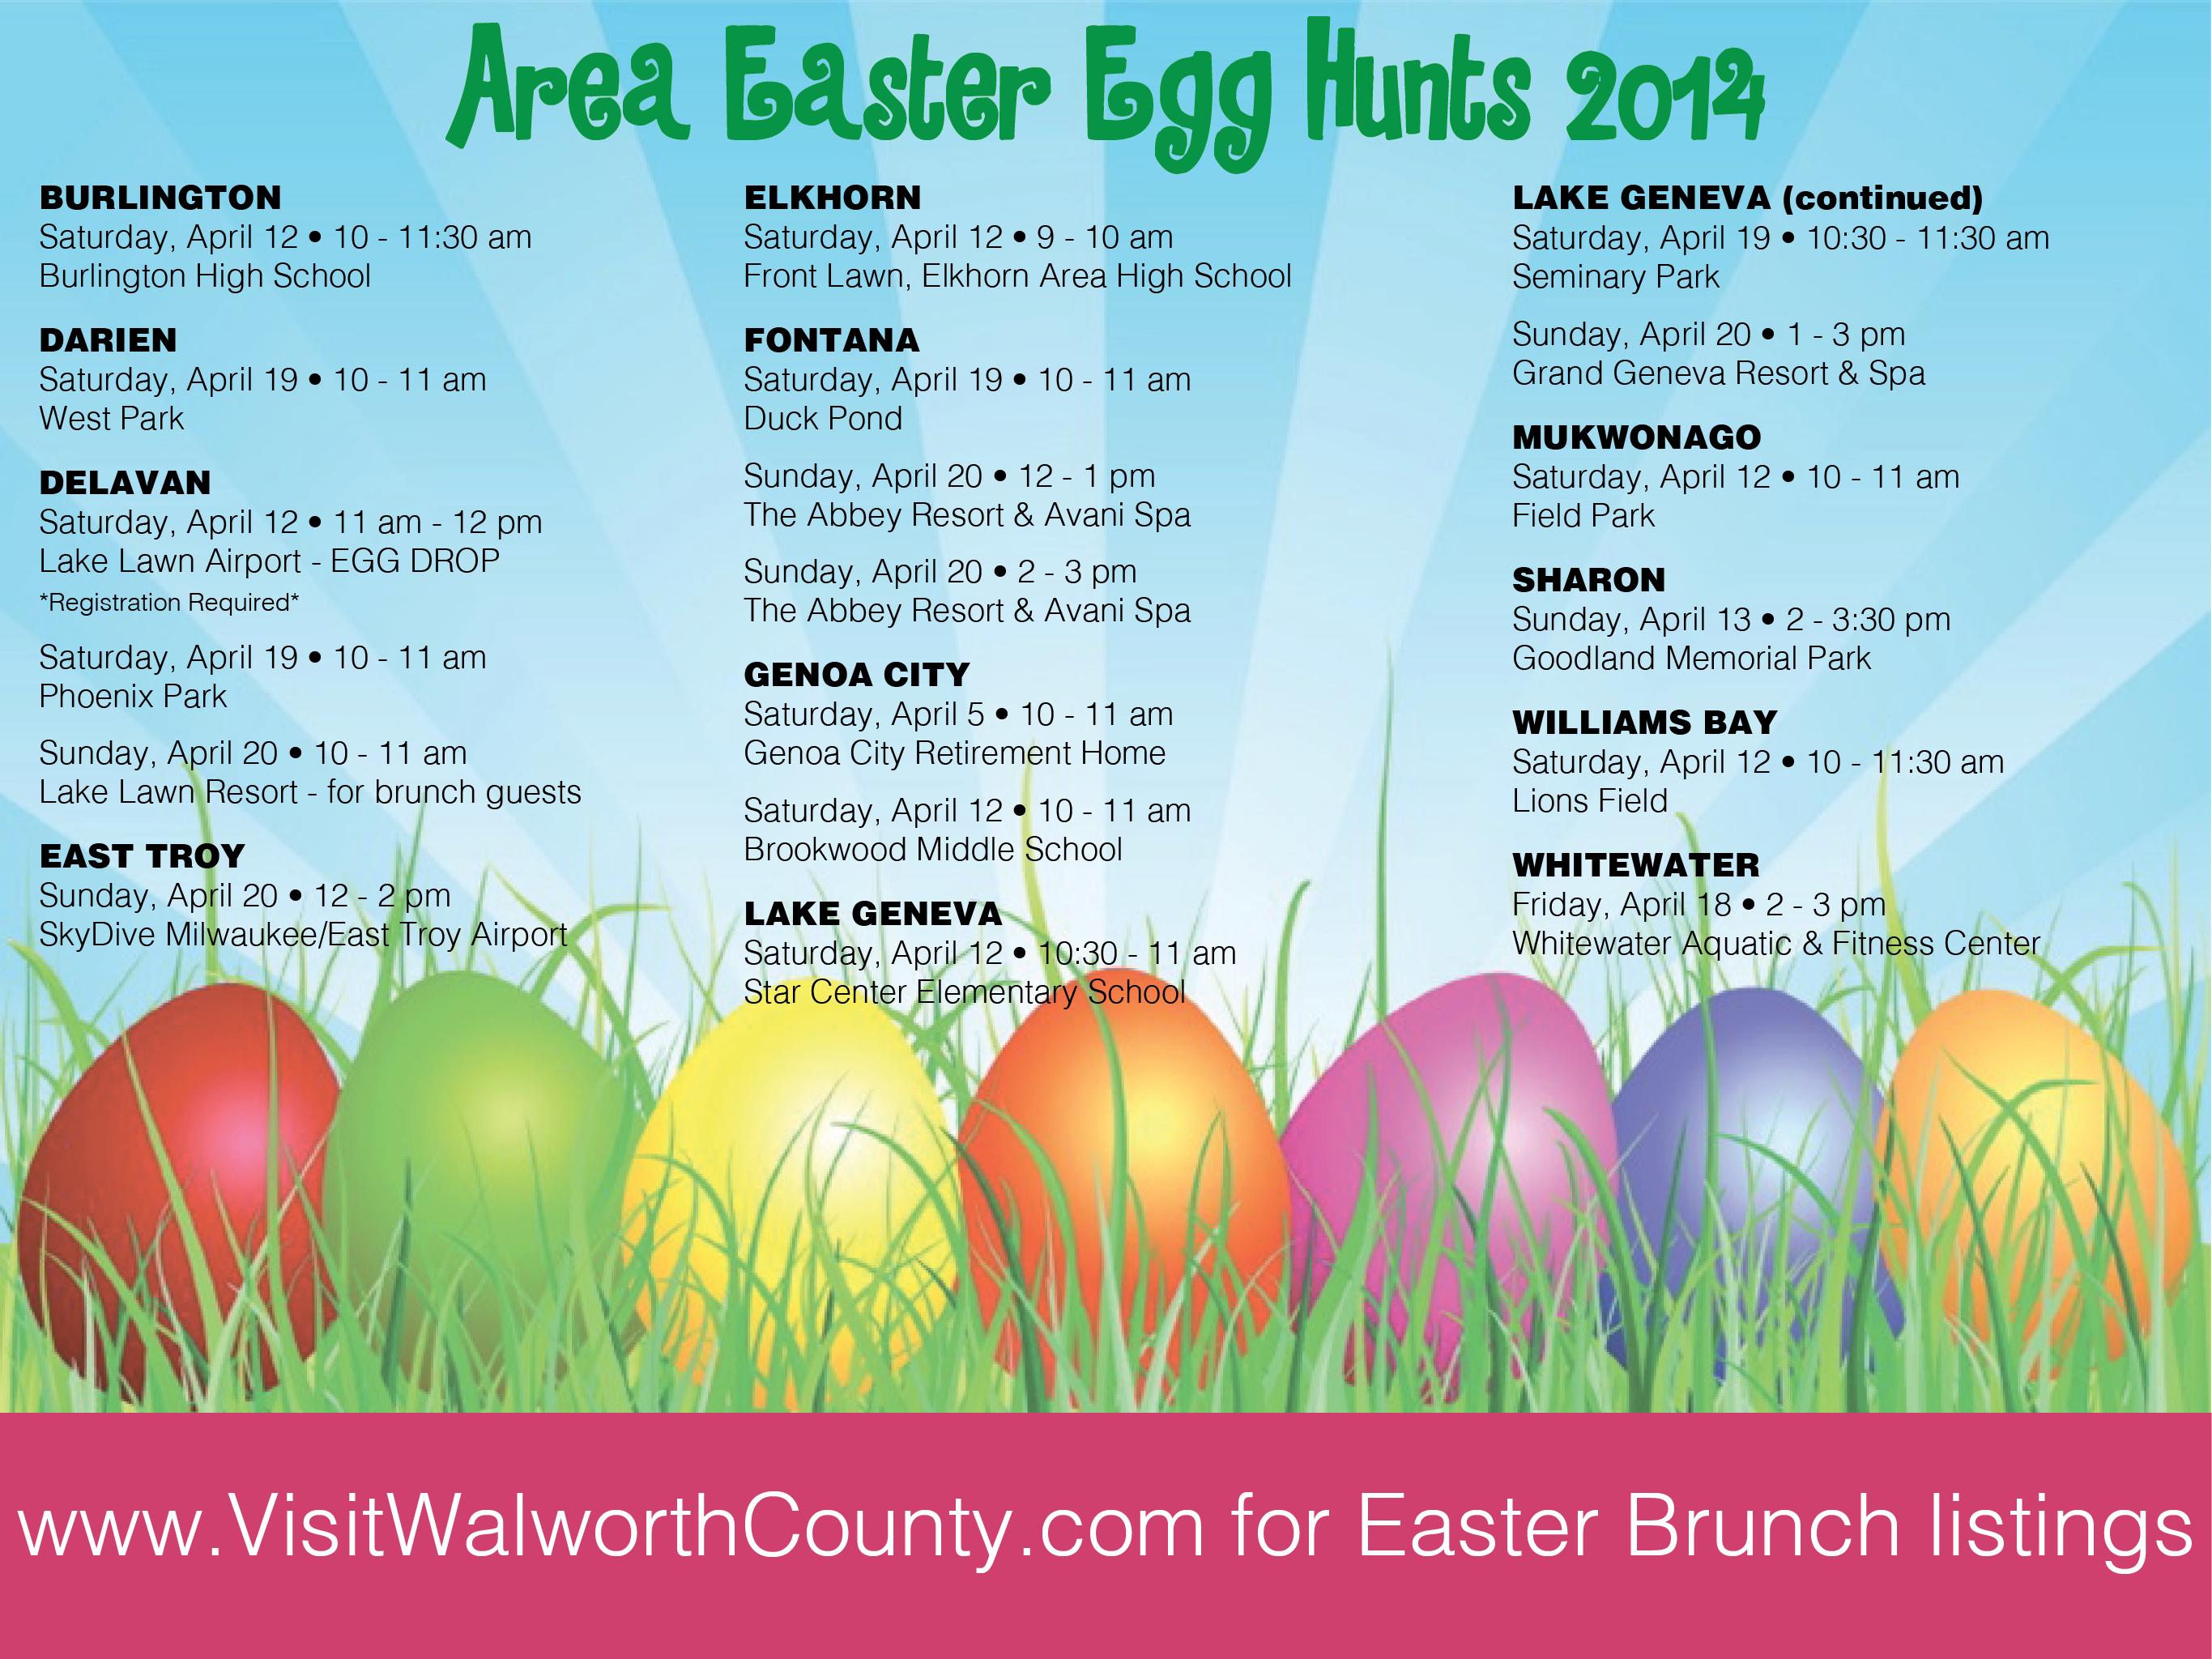 Easter egg hunt adults ideas